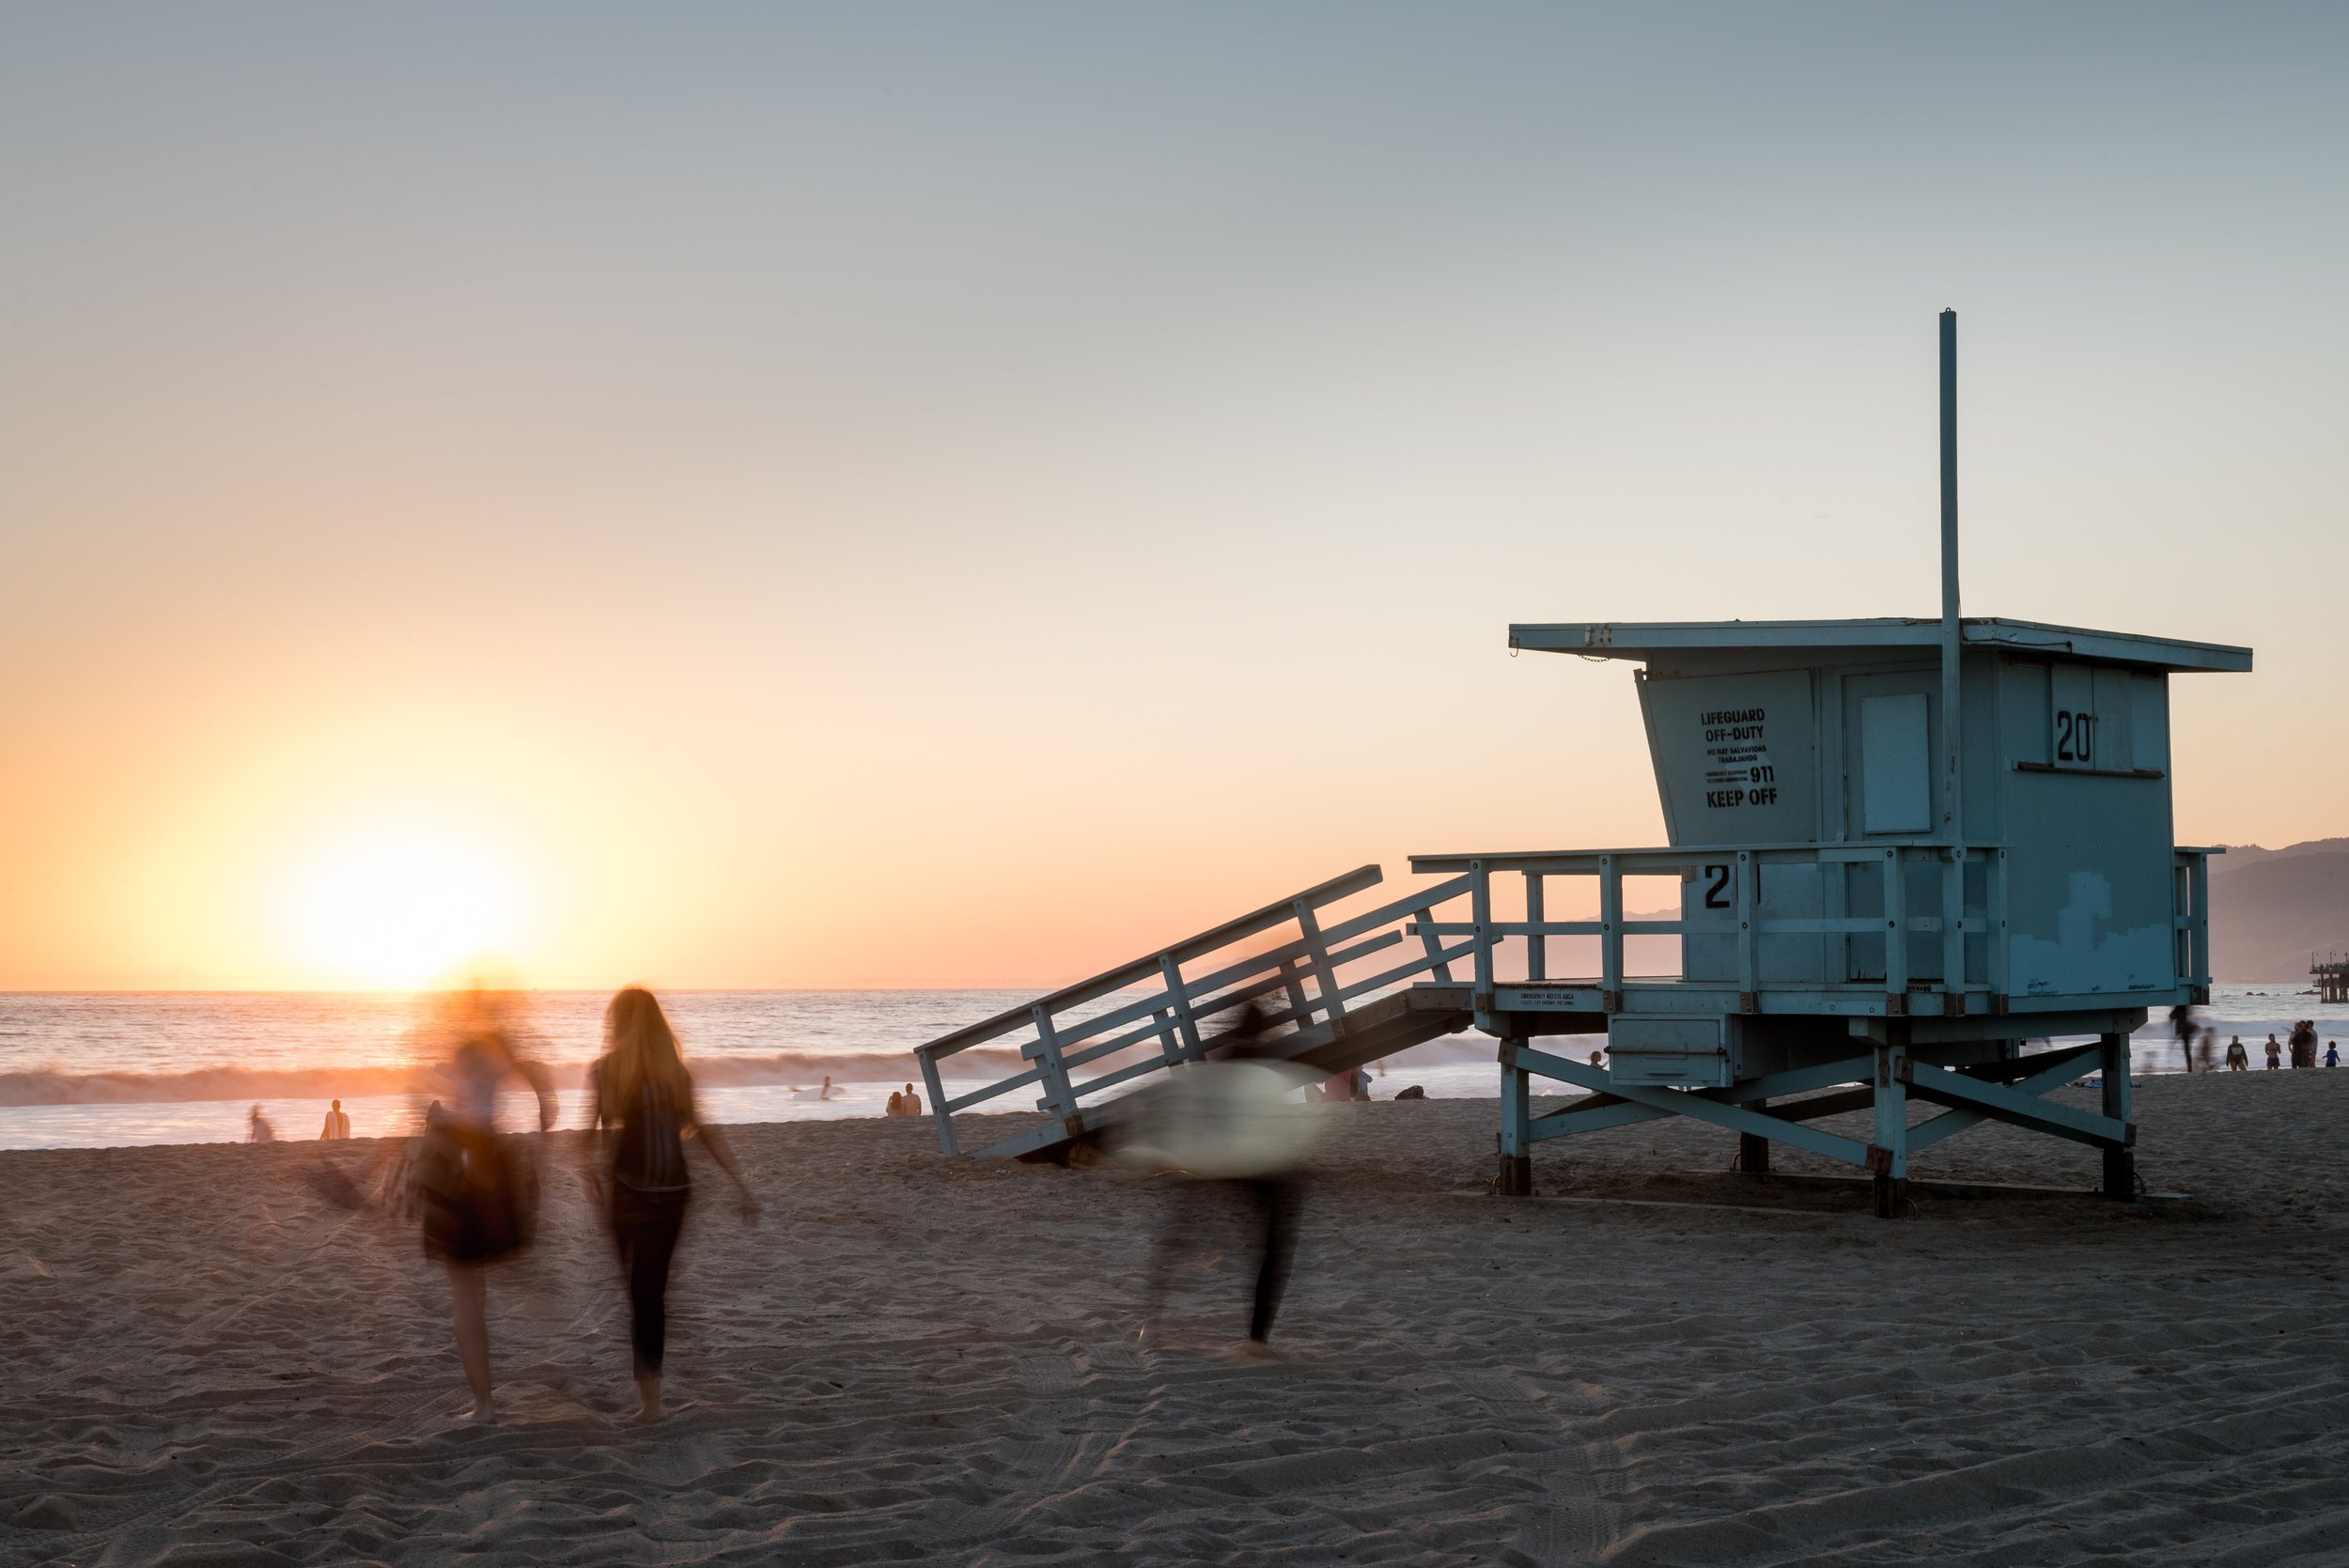 baywatch-beach-blur-745236.jpg